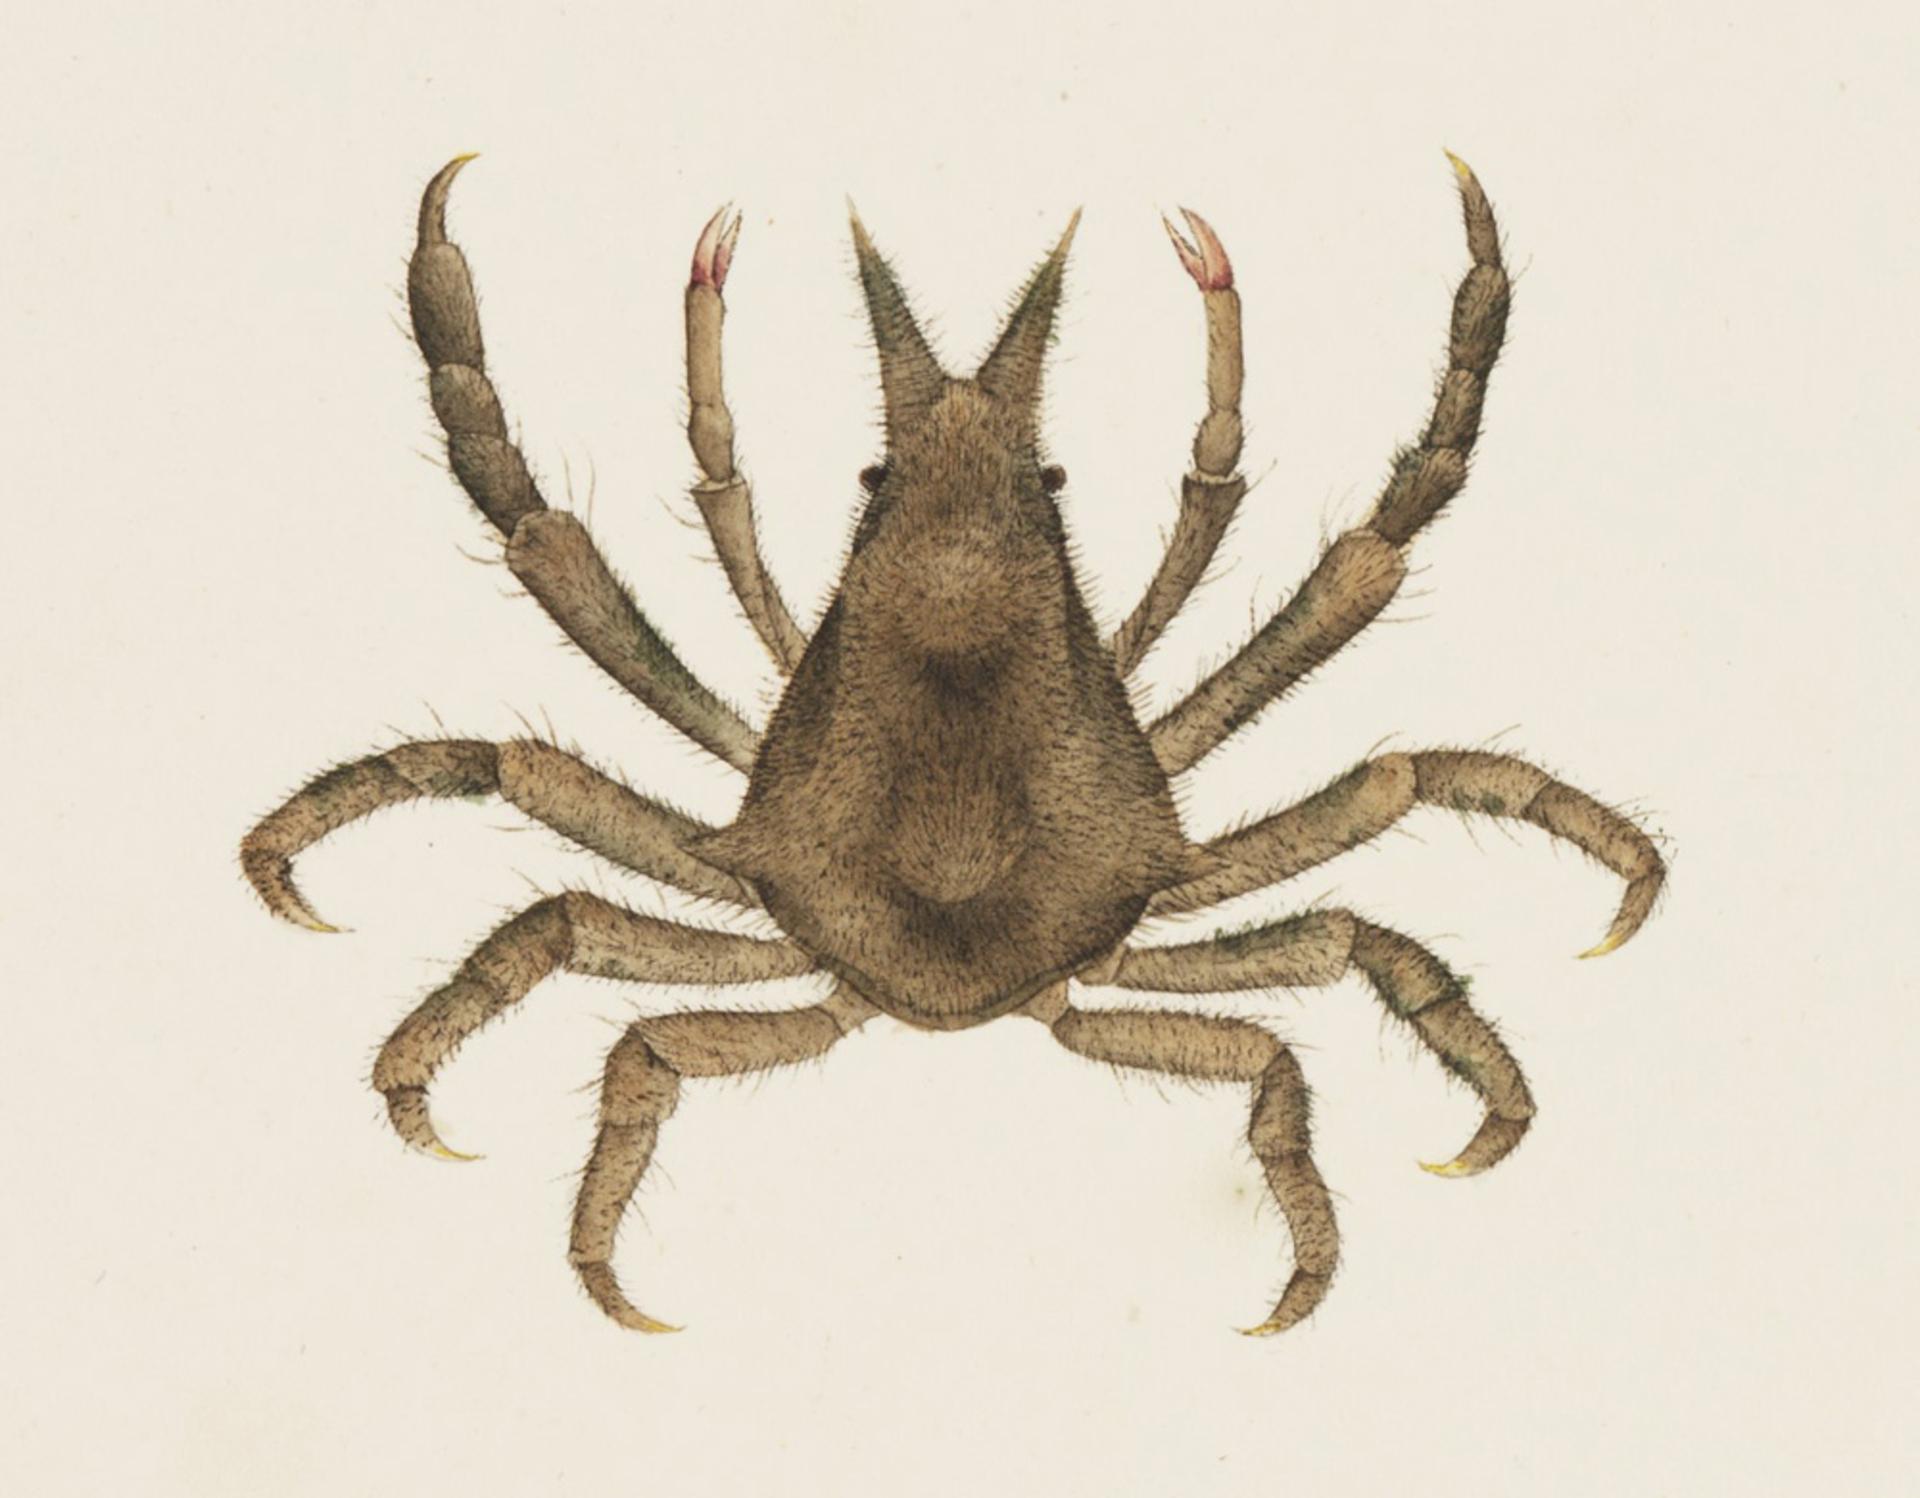 RMNH.ART.882   Hyastenus diacanthus